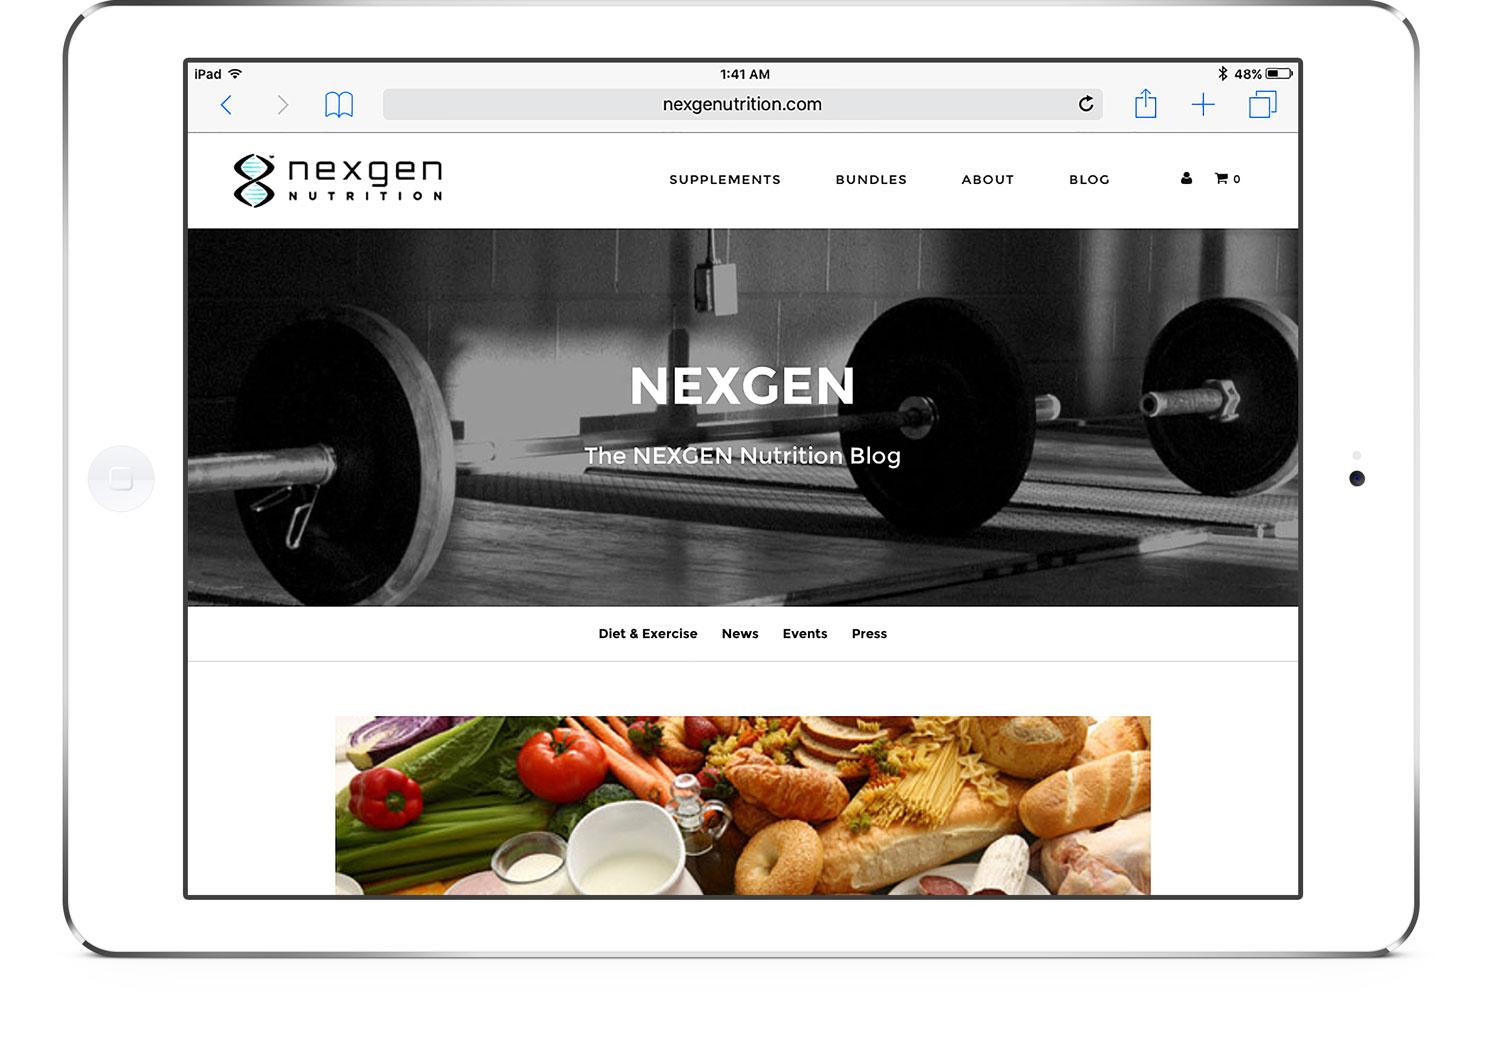 nexgen nutrition website on ipad